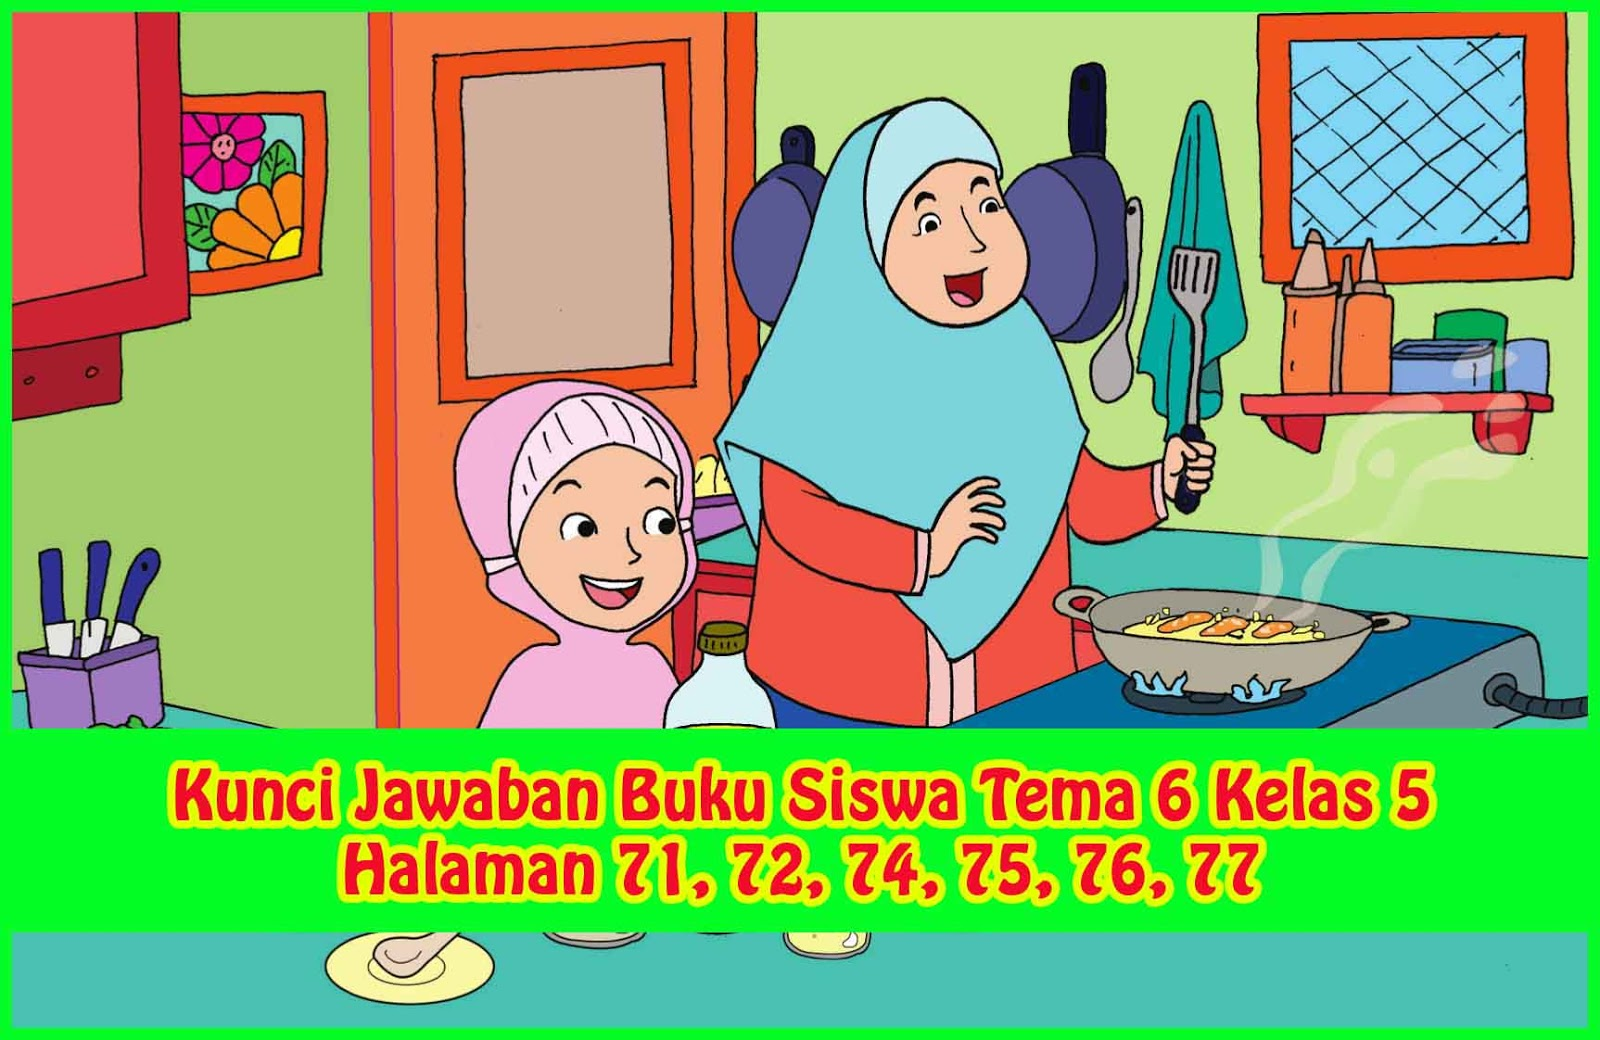 Kunci Jawaban Bahasa Sunda Kelas 5 Sd Halaman 31